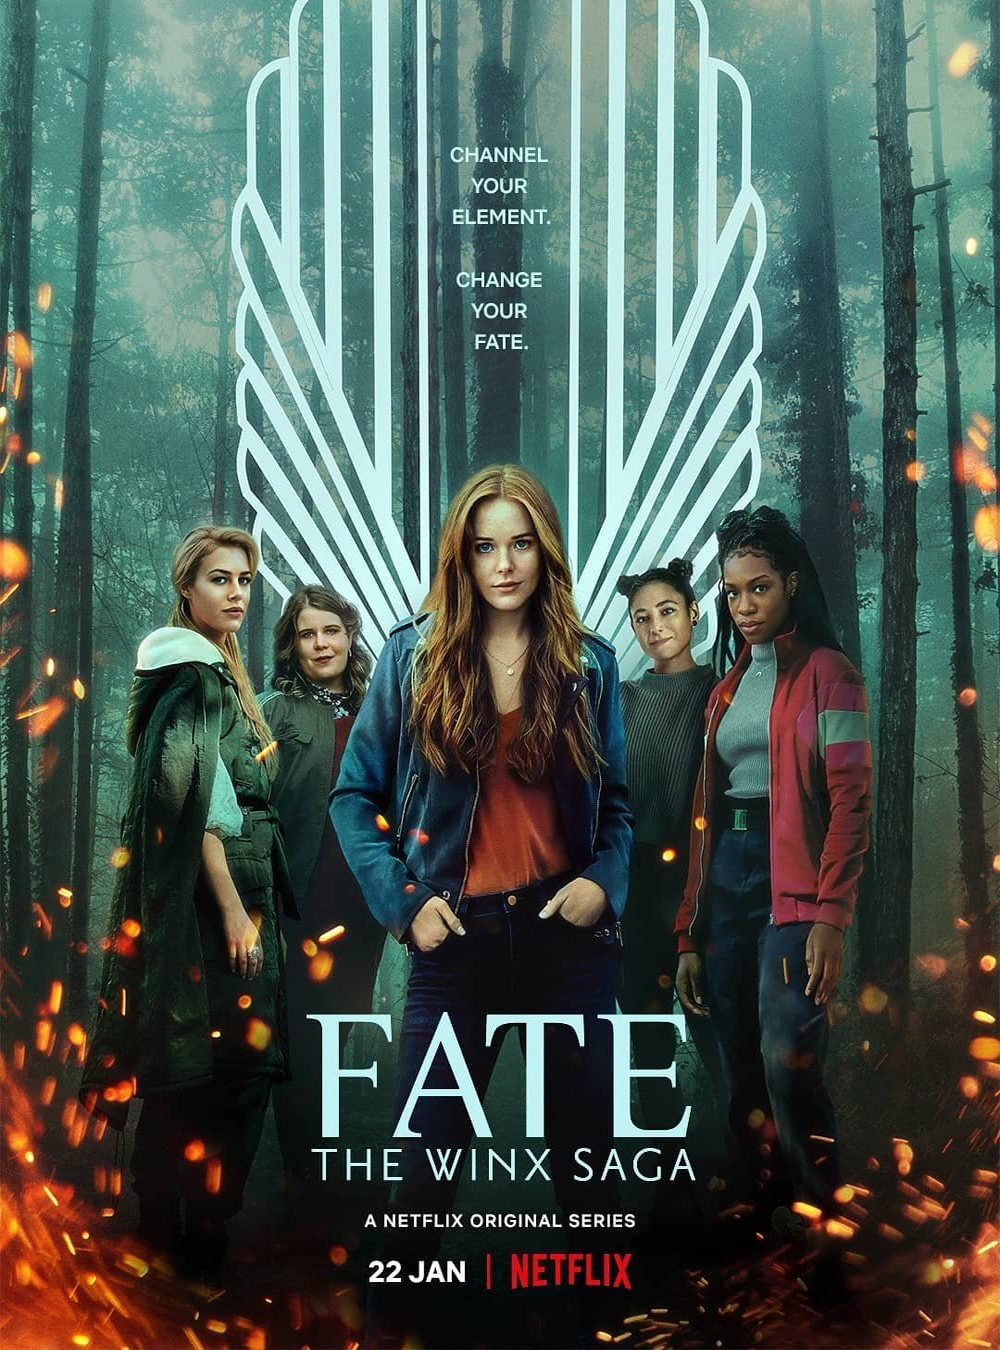 Fate The Winx Saga 2021